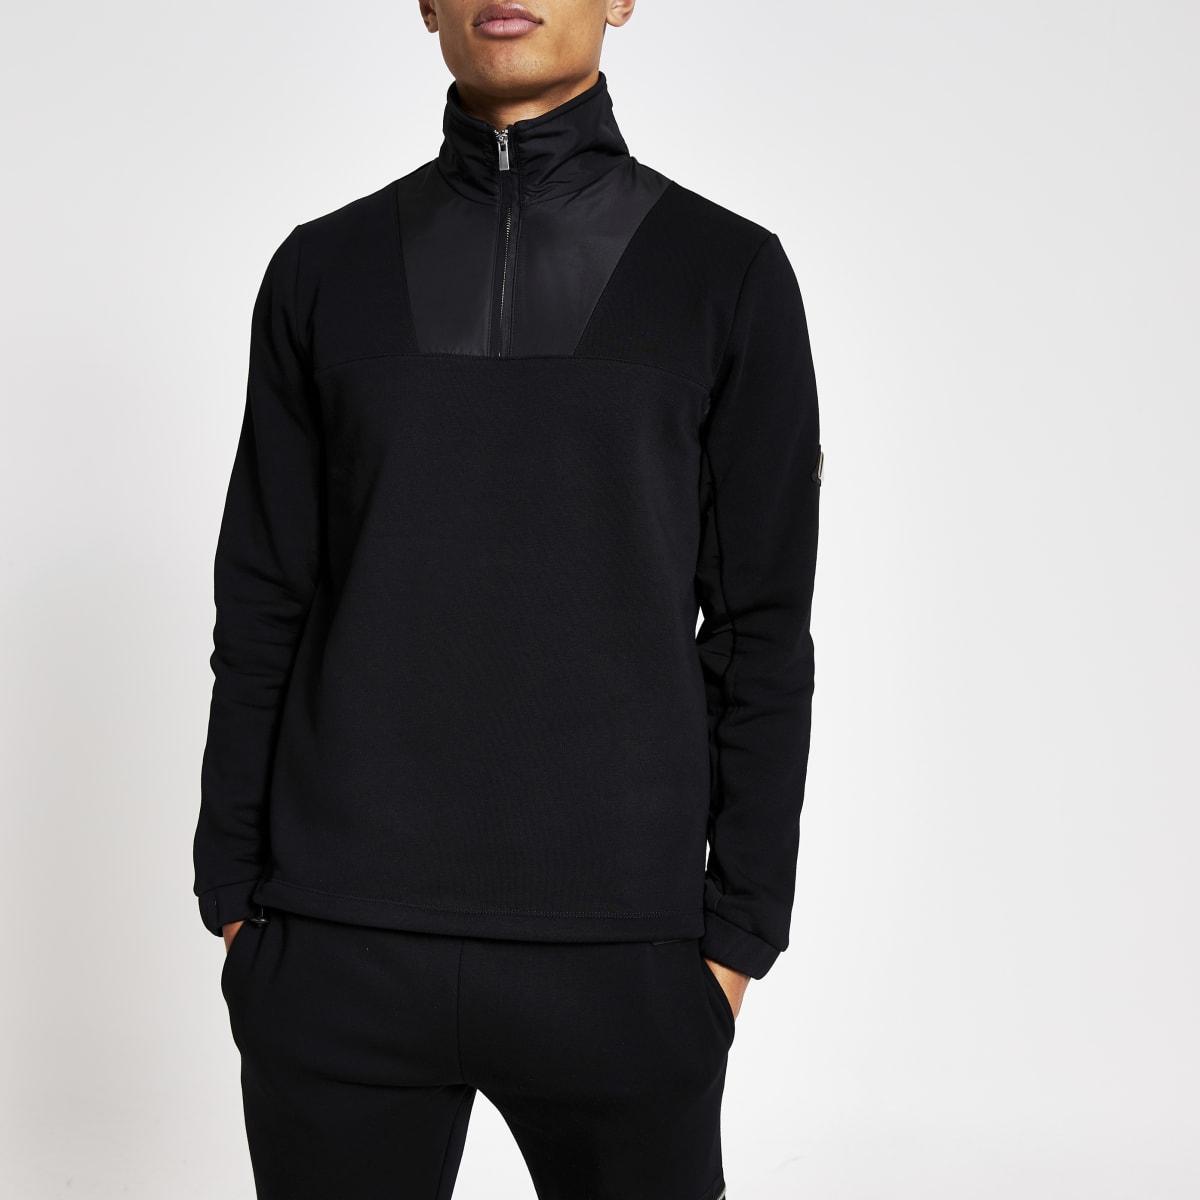 MCMLX black funnel neck slim fit sweatshirt